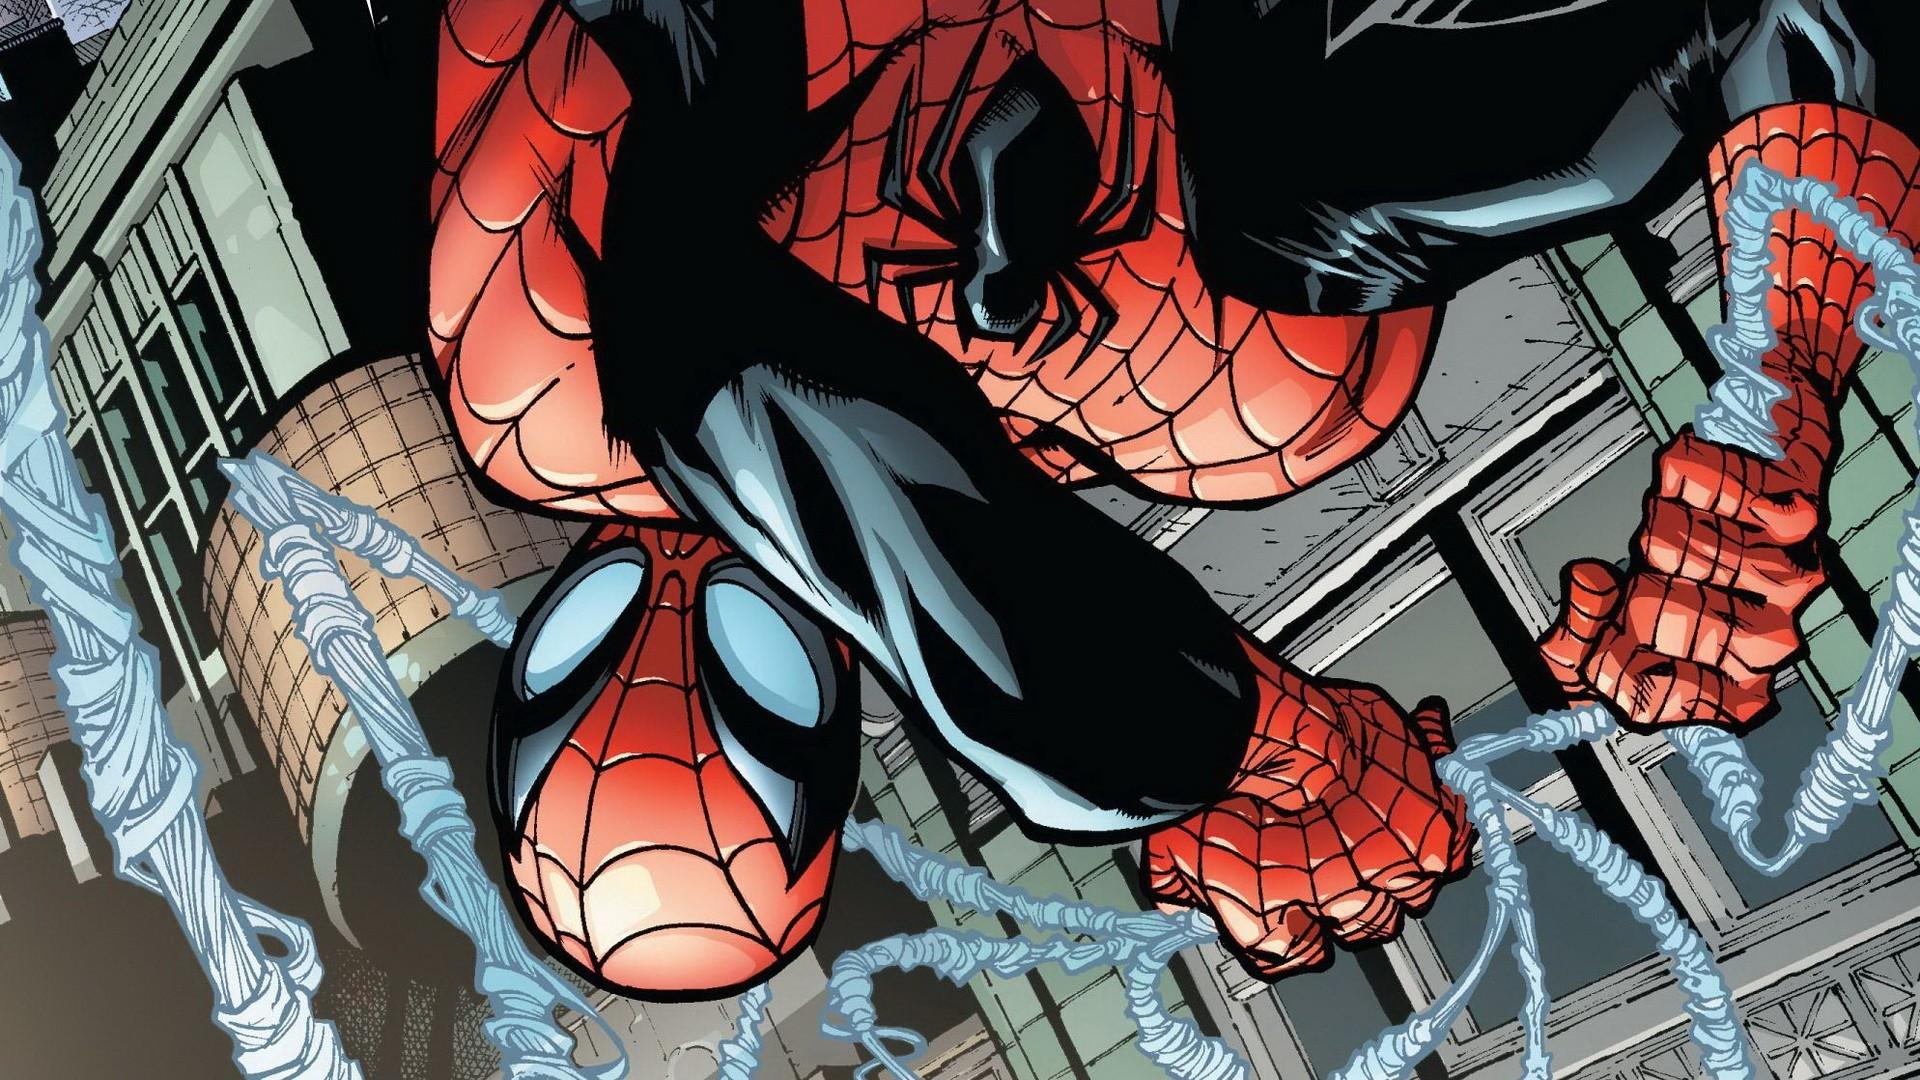 10 Most Popular Spider Man 2099 Wallpaper Hd Full Hd 1920: Superior Spiderman Wallpaper HD (74+ Images